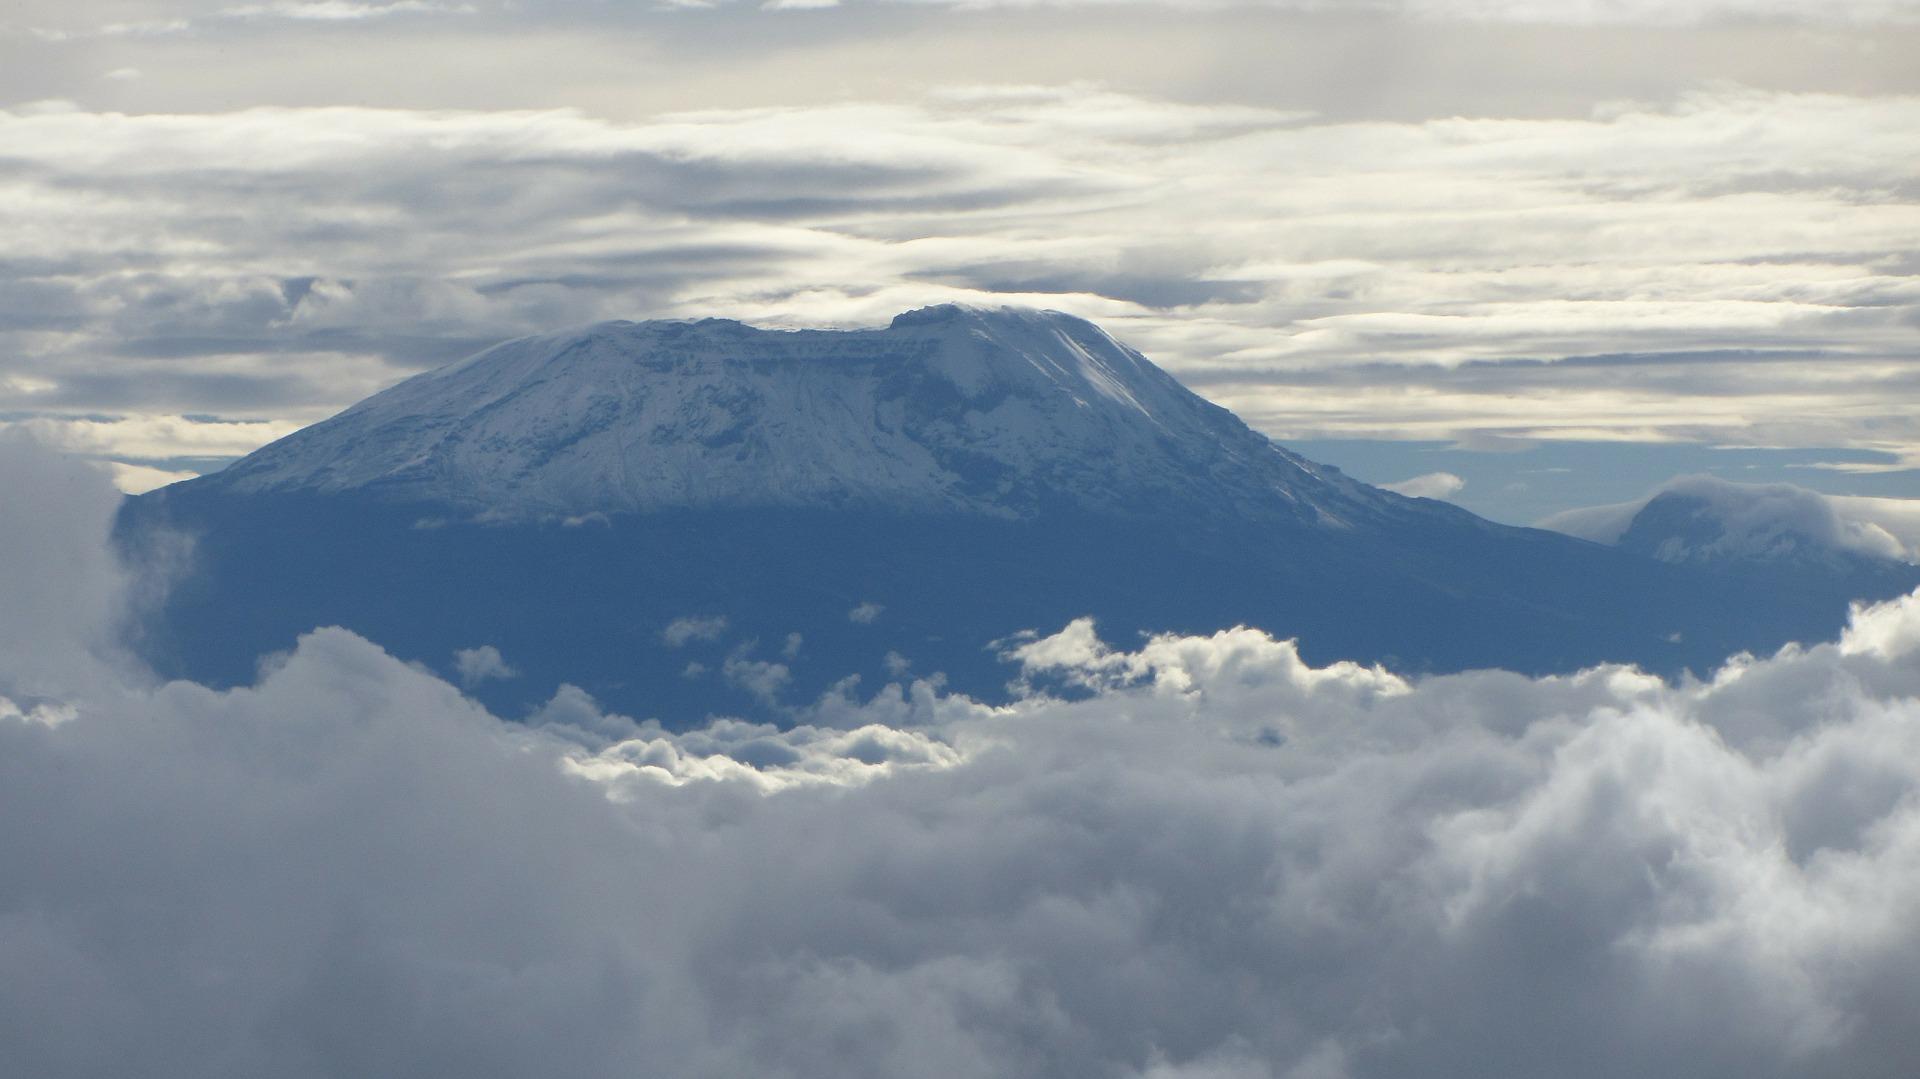 kilimanjaro-279998_1920.jpg